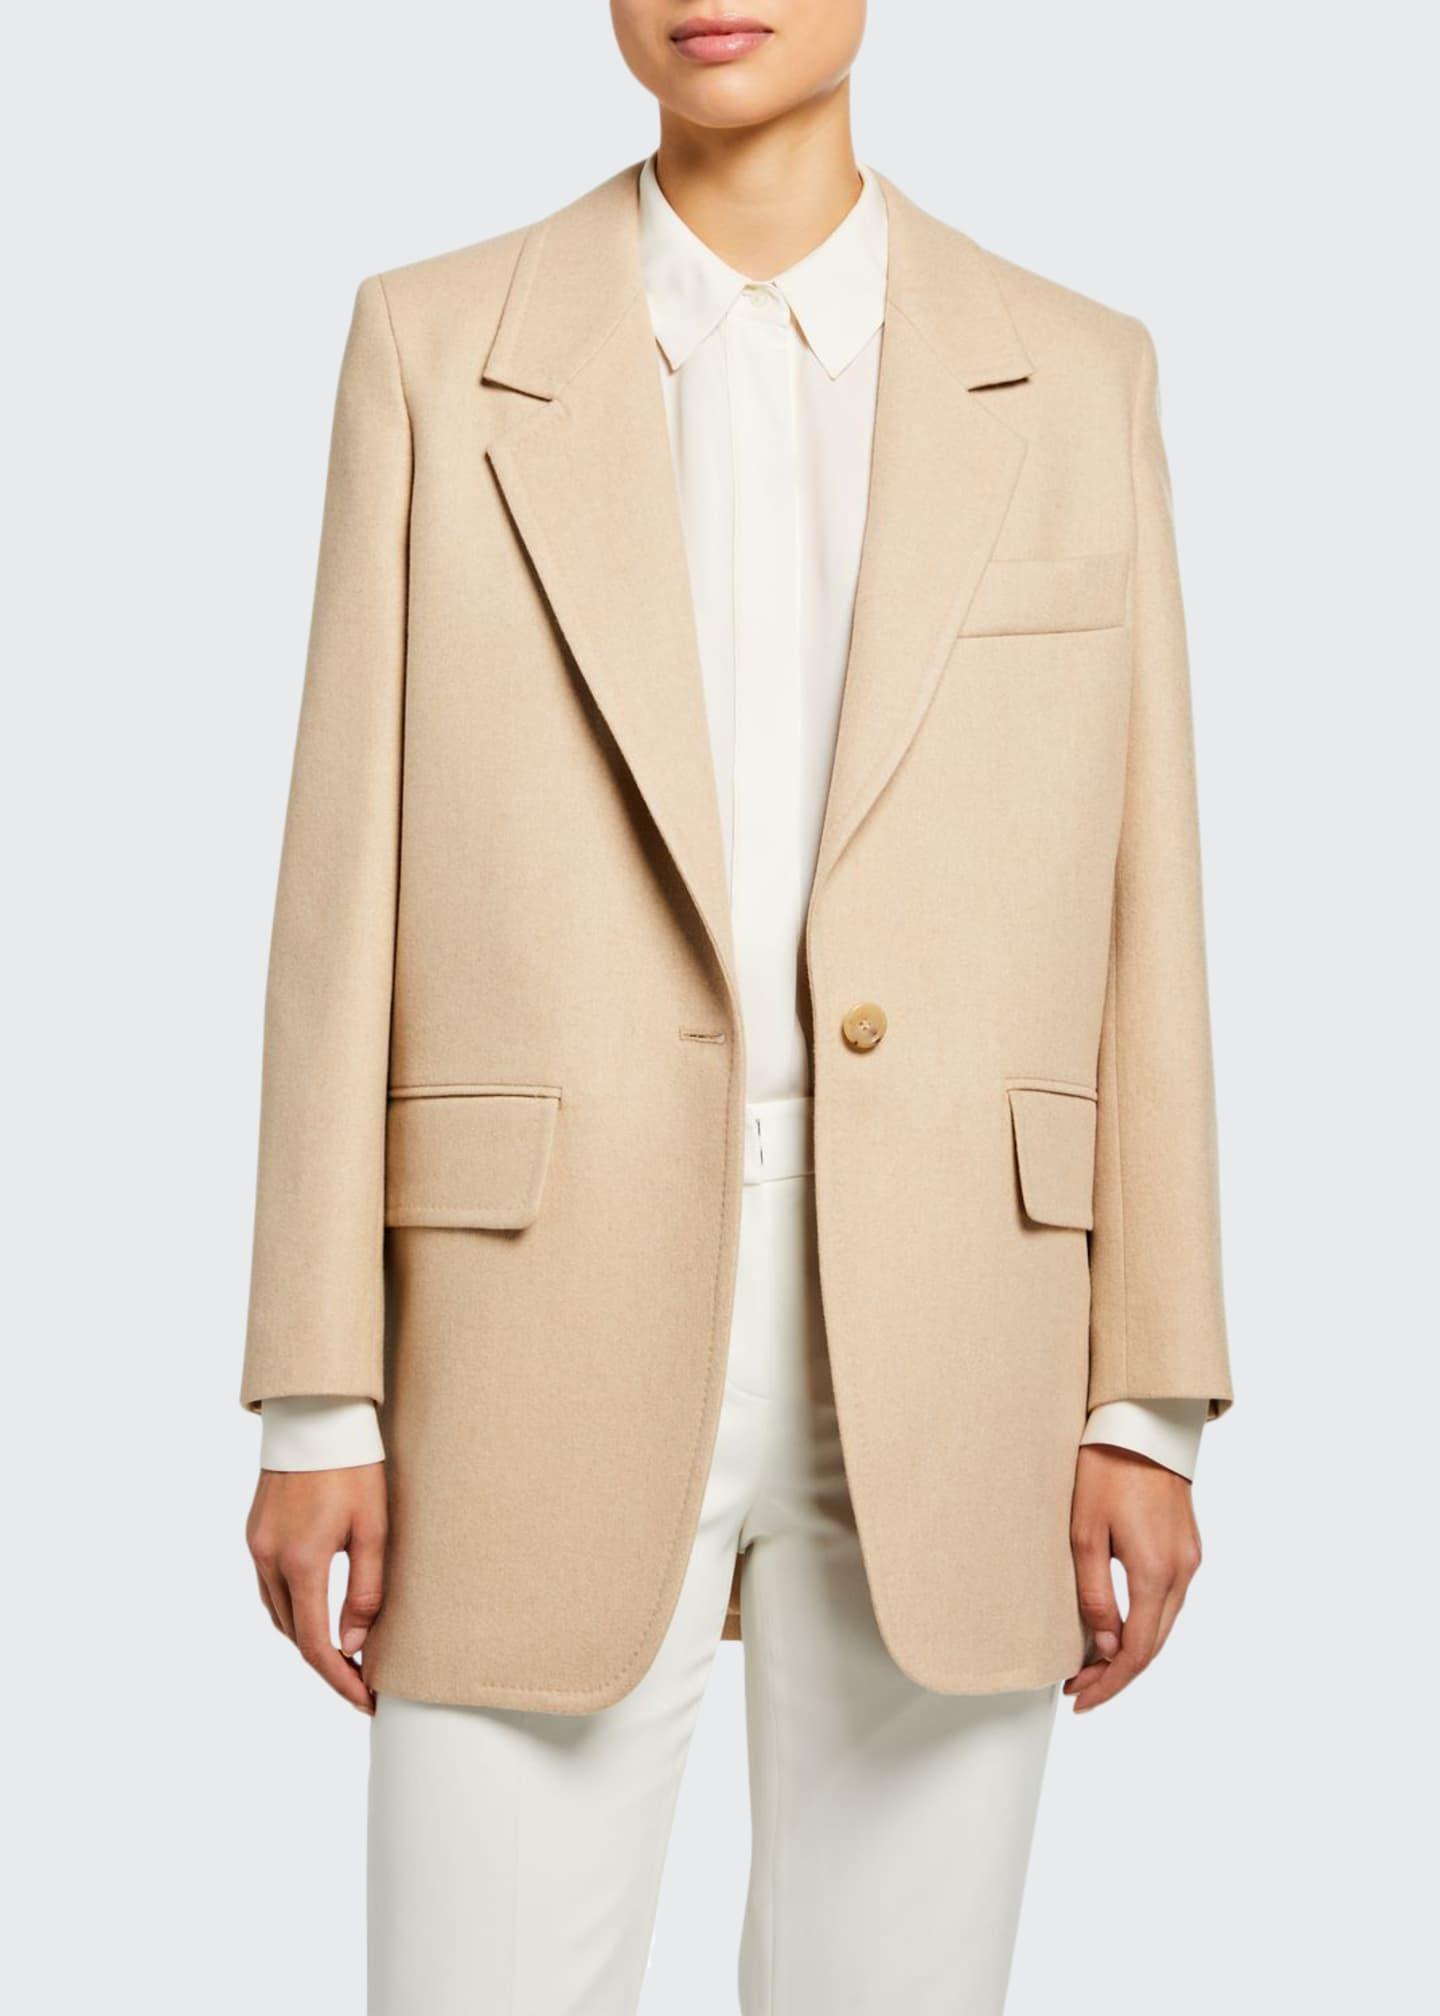 Maxmara Edipo Camel Wool-Cashmere Jacket